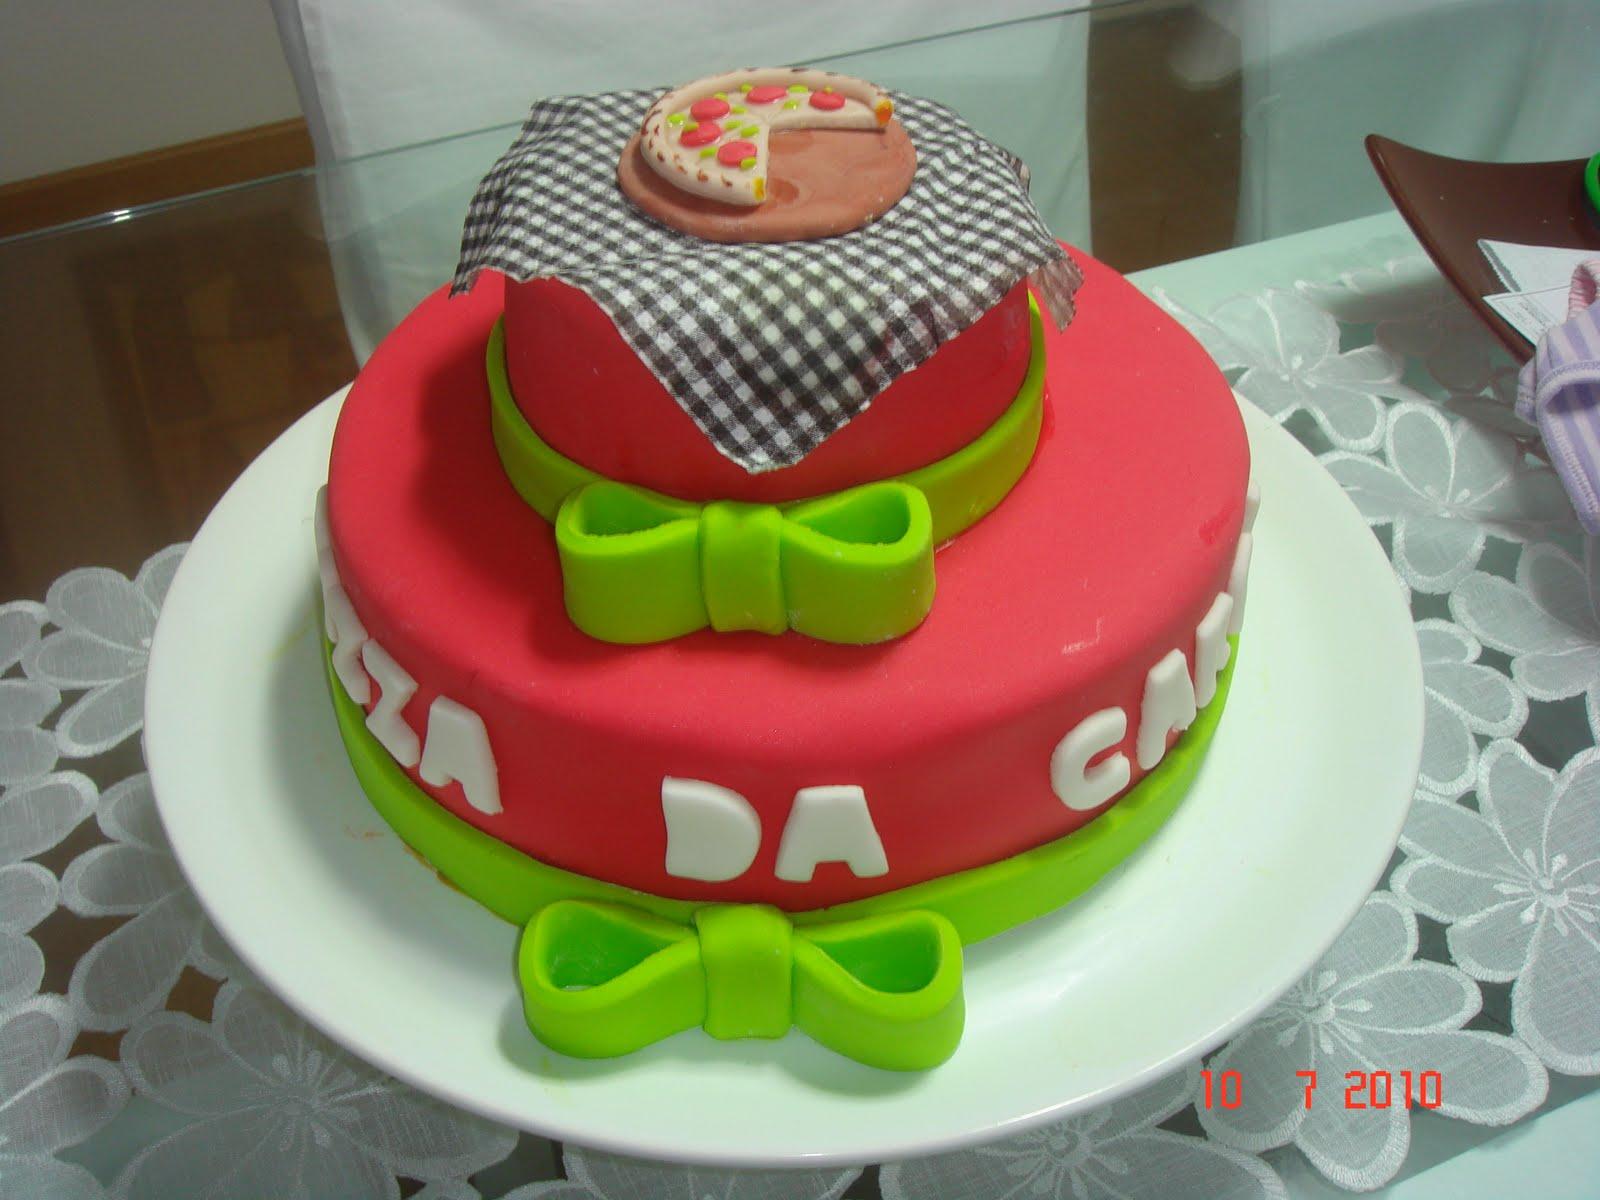 Pin karina kruschewsky cake design bolo pizza cake picture to